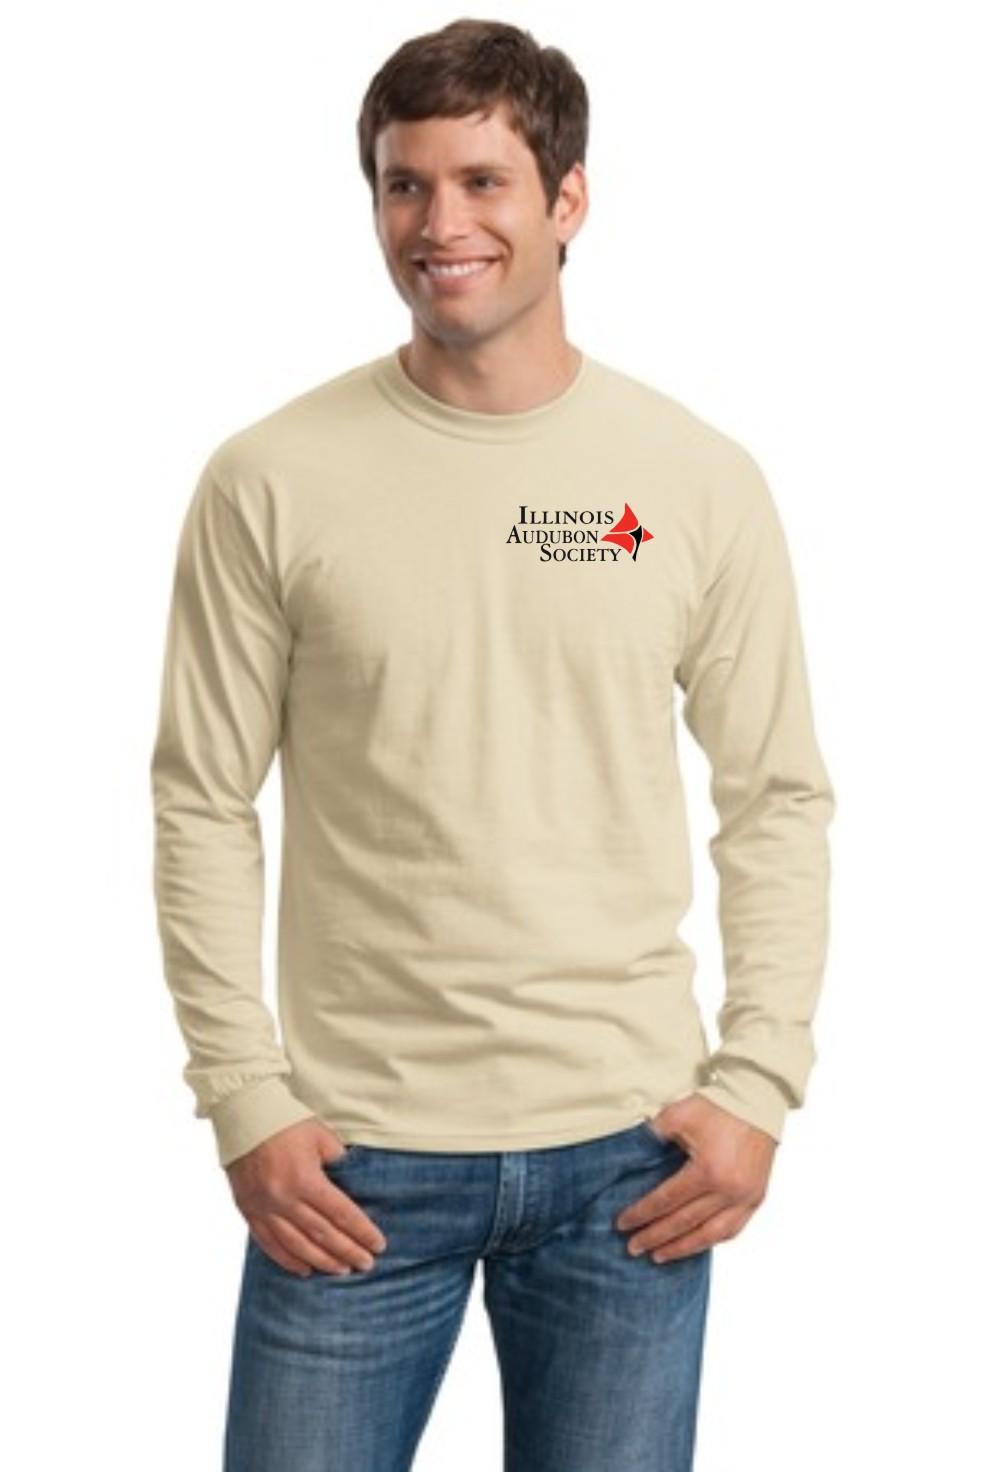 Illinois Audubon Society Adult Cotton Long Sleeve T-Shirt ...